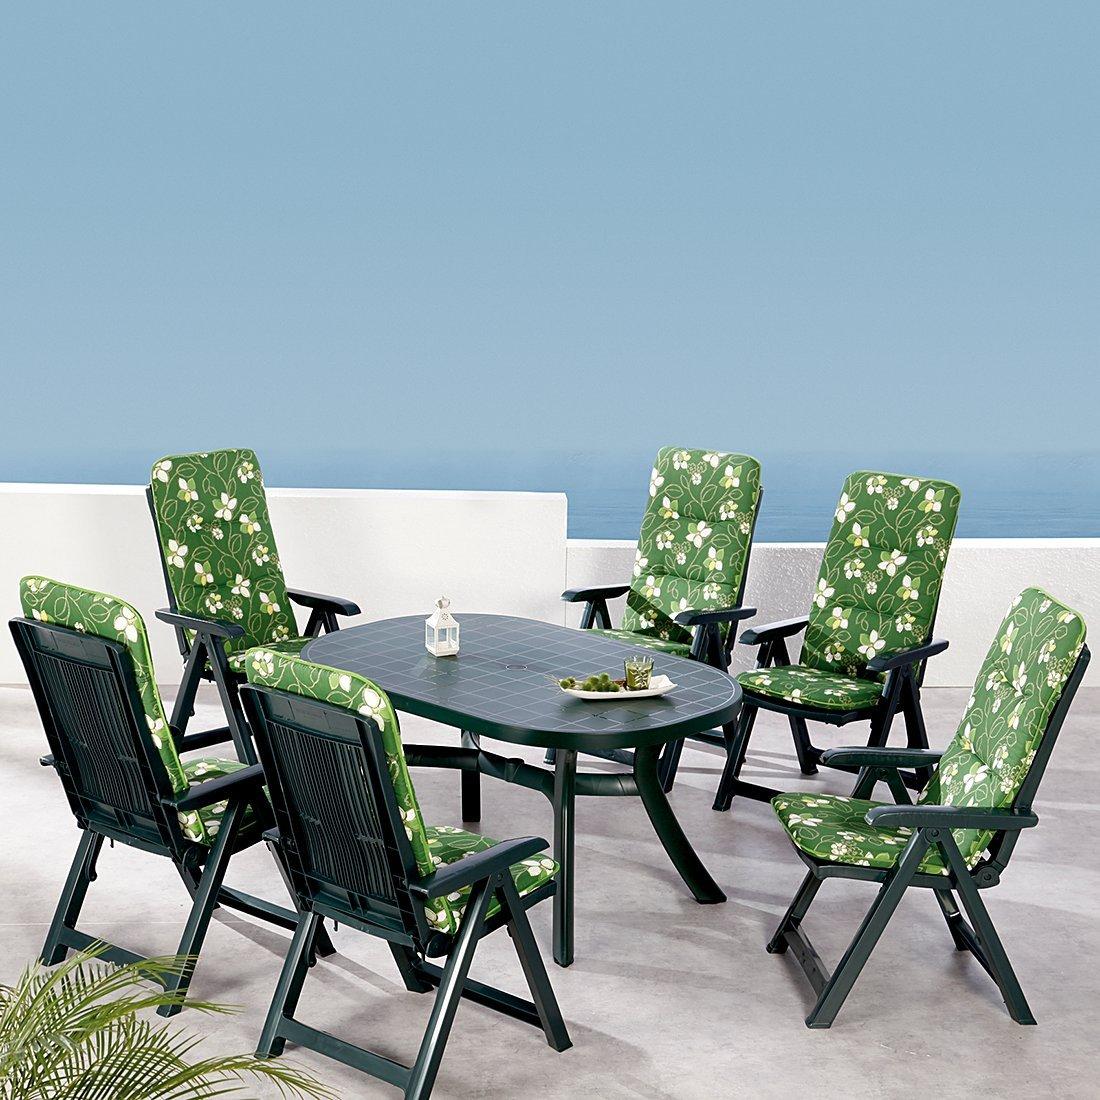 BEST 96236233 13-teilig Komplett Set Santiago, Gartenmöbel, D.1262, grün kaufen